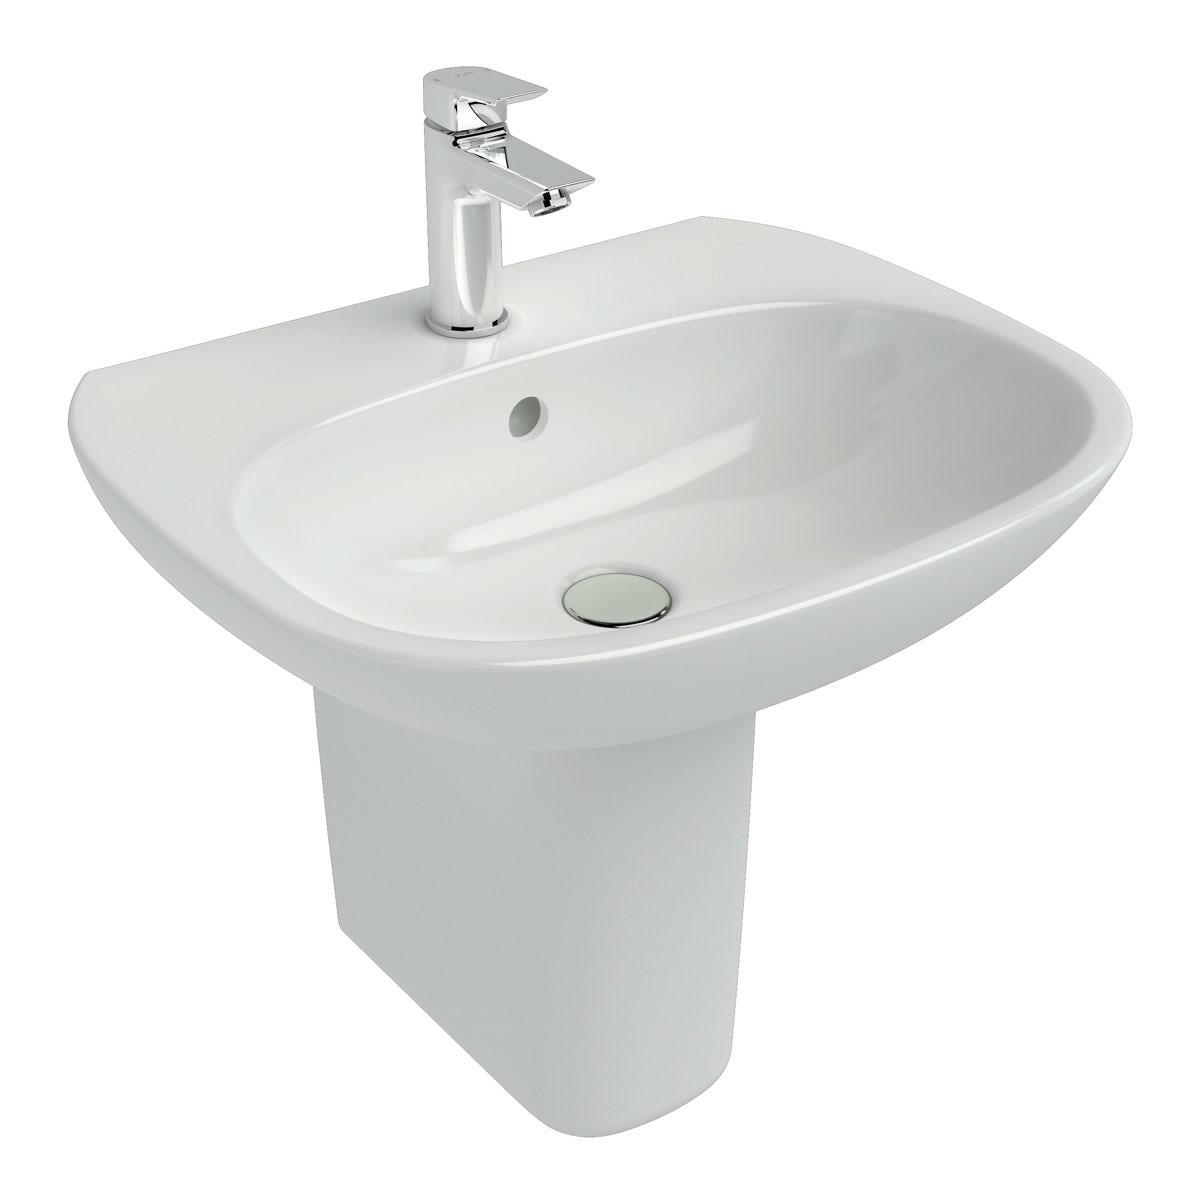 Ideal standard tesi 1 tap hole semi pedestal basin for Ideal standard diagonal